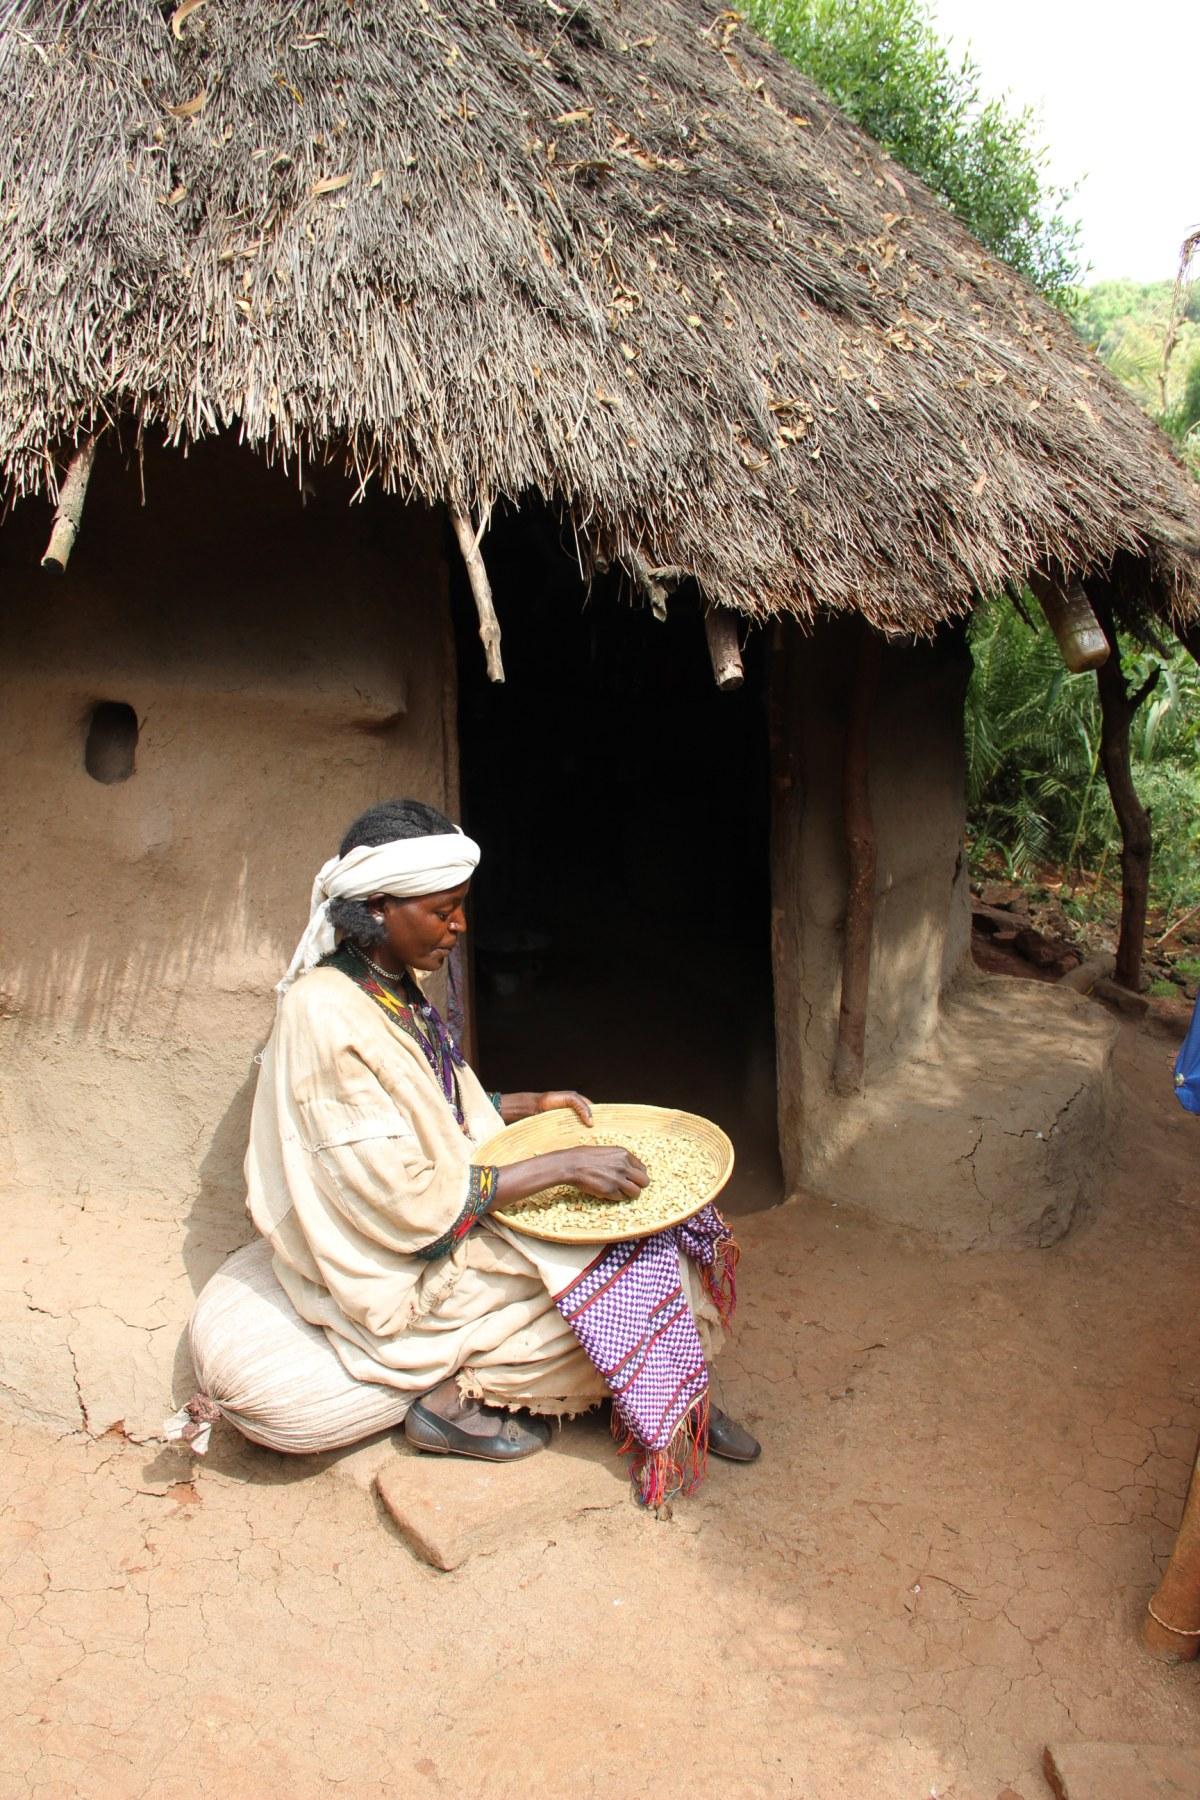 descriptive essay of a village